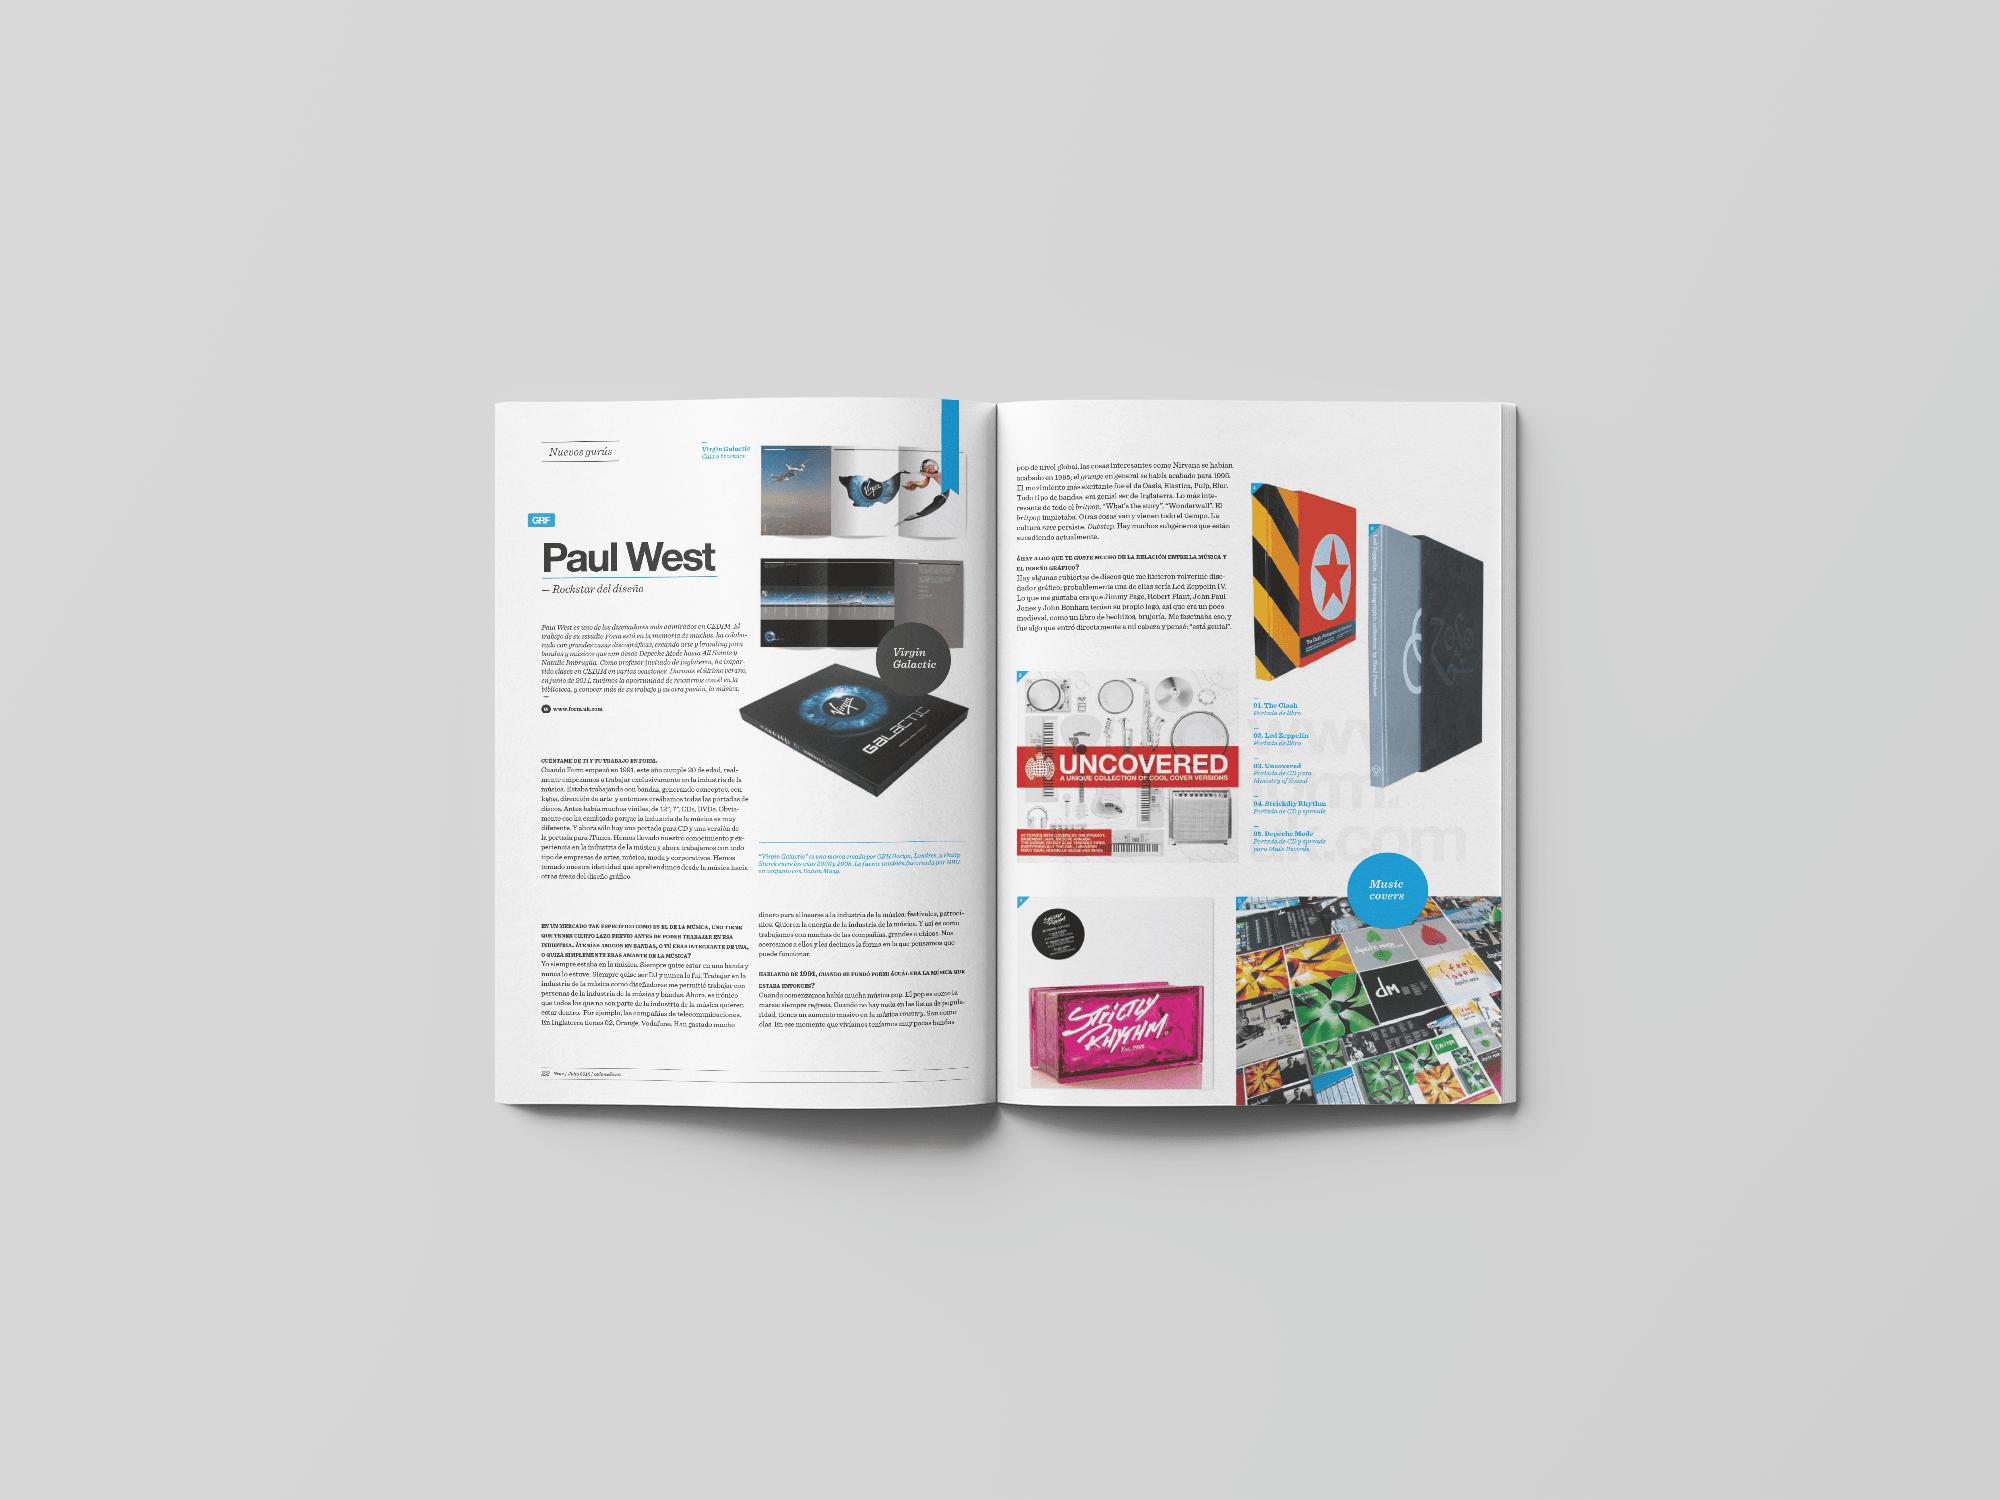 spread07-neue02-magazine-cedim-yoenpaperland-compressor